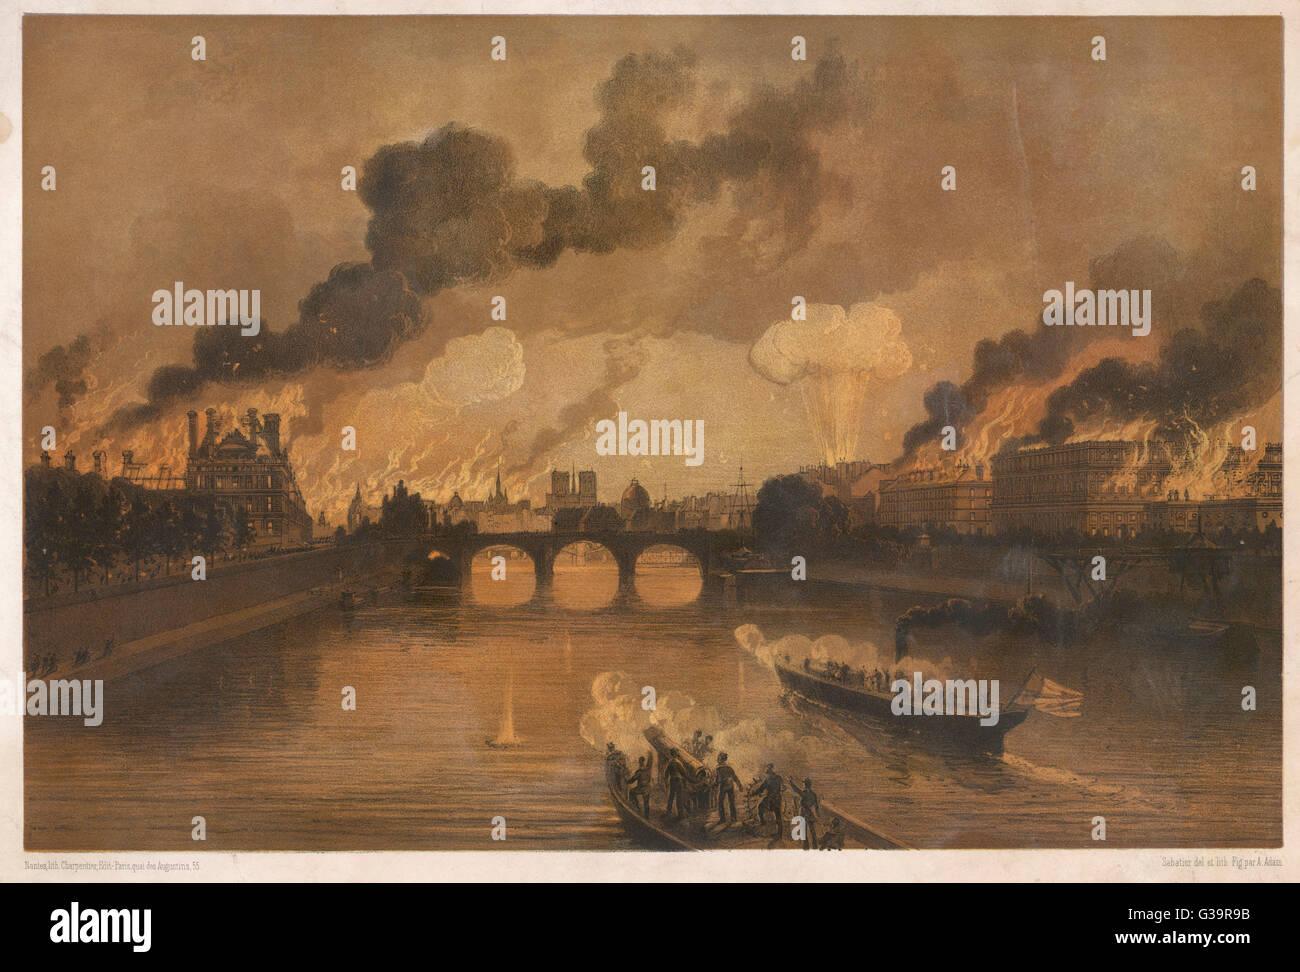 Paris Flammen Datum: 24. Mai 1871 Stockfoto